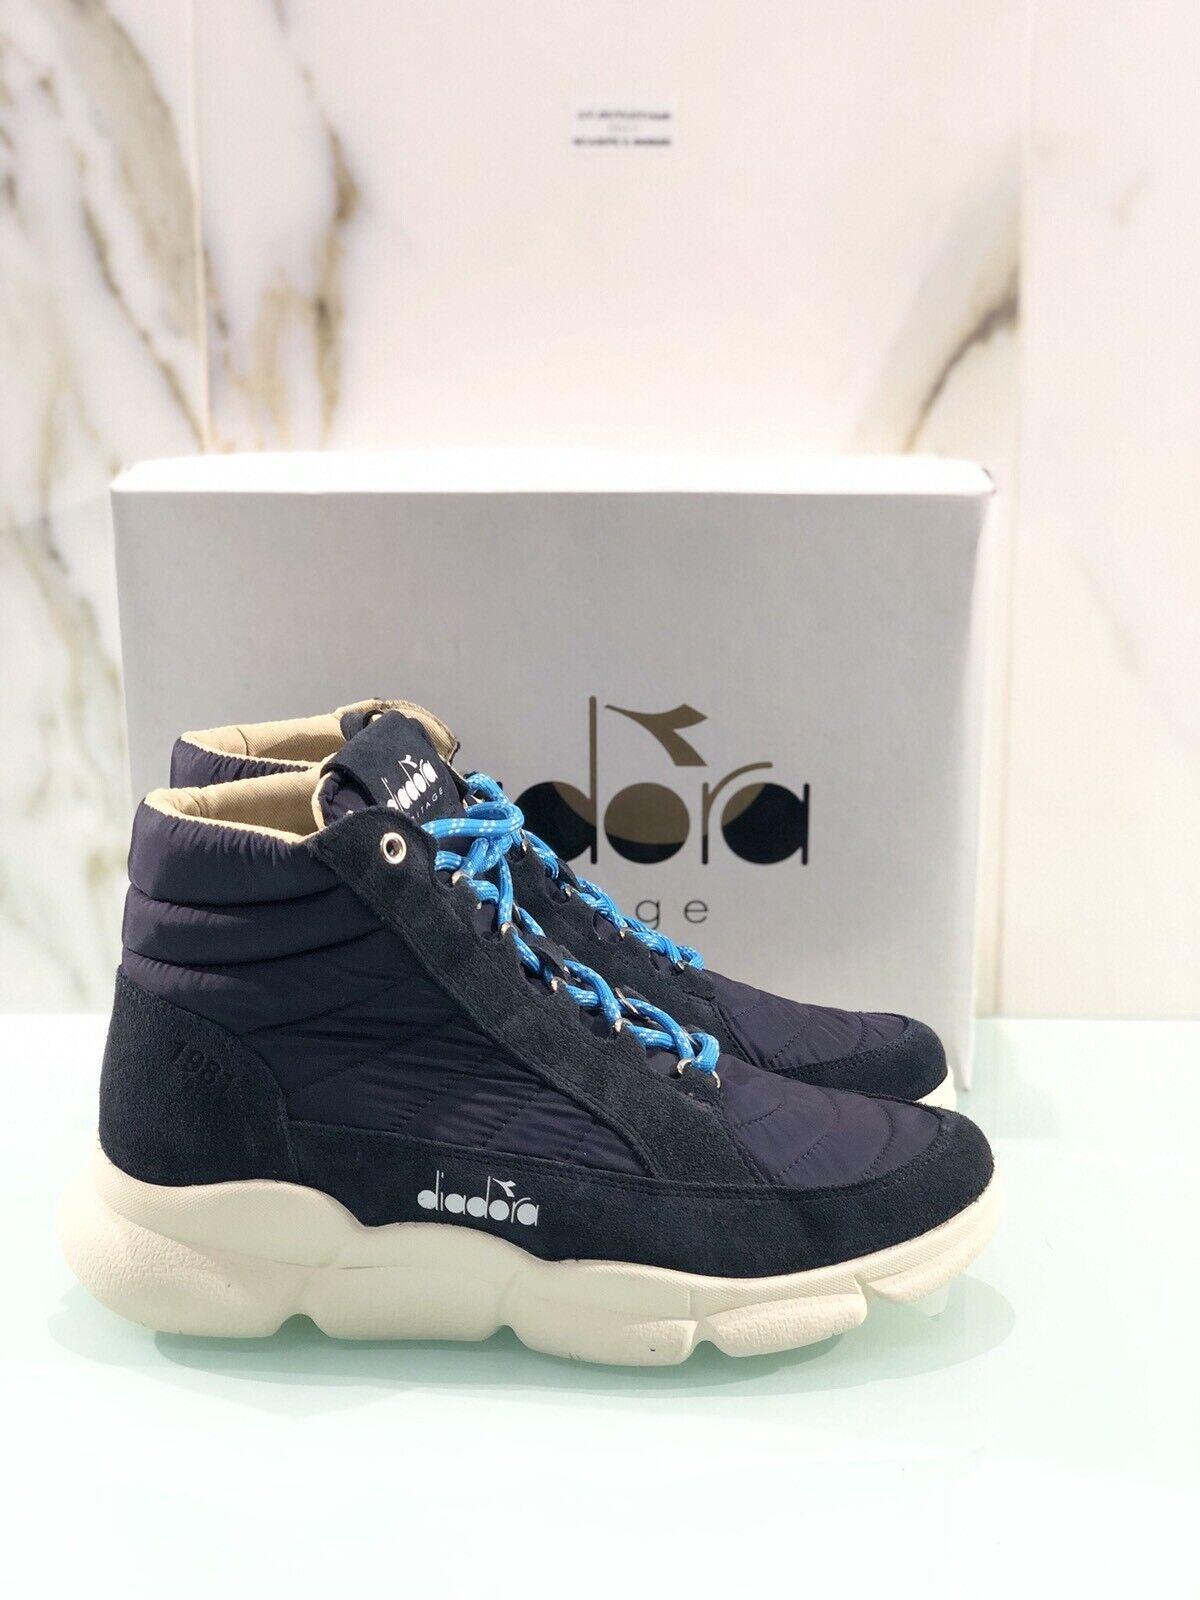 Diadora Heritage Boot H In Camoacio bluee Background Vibram Casual Sneaker Man